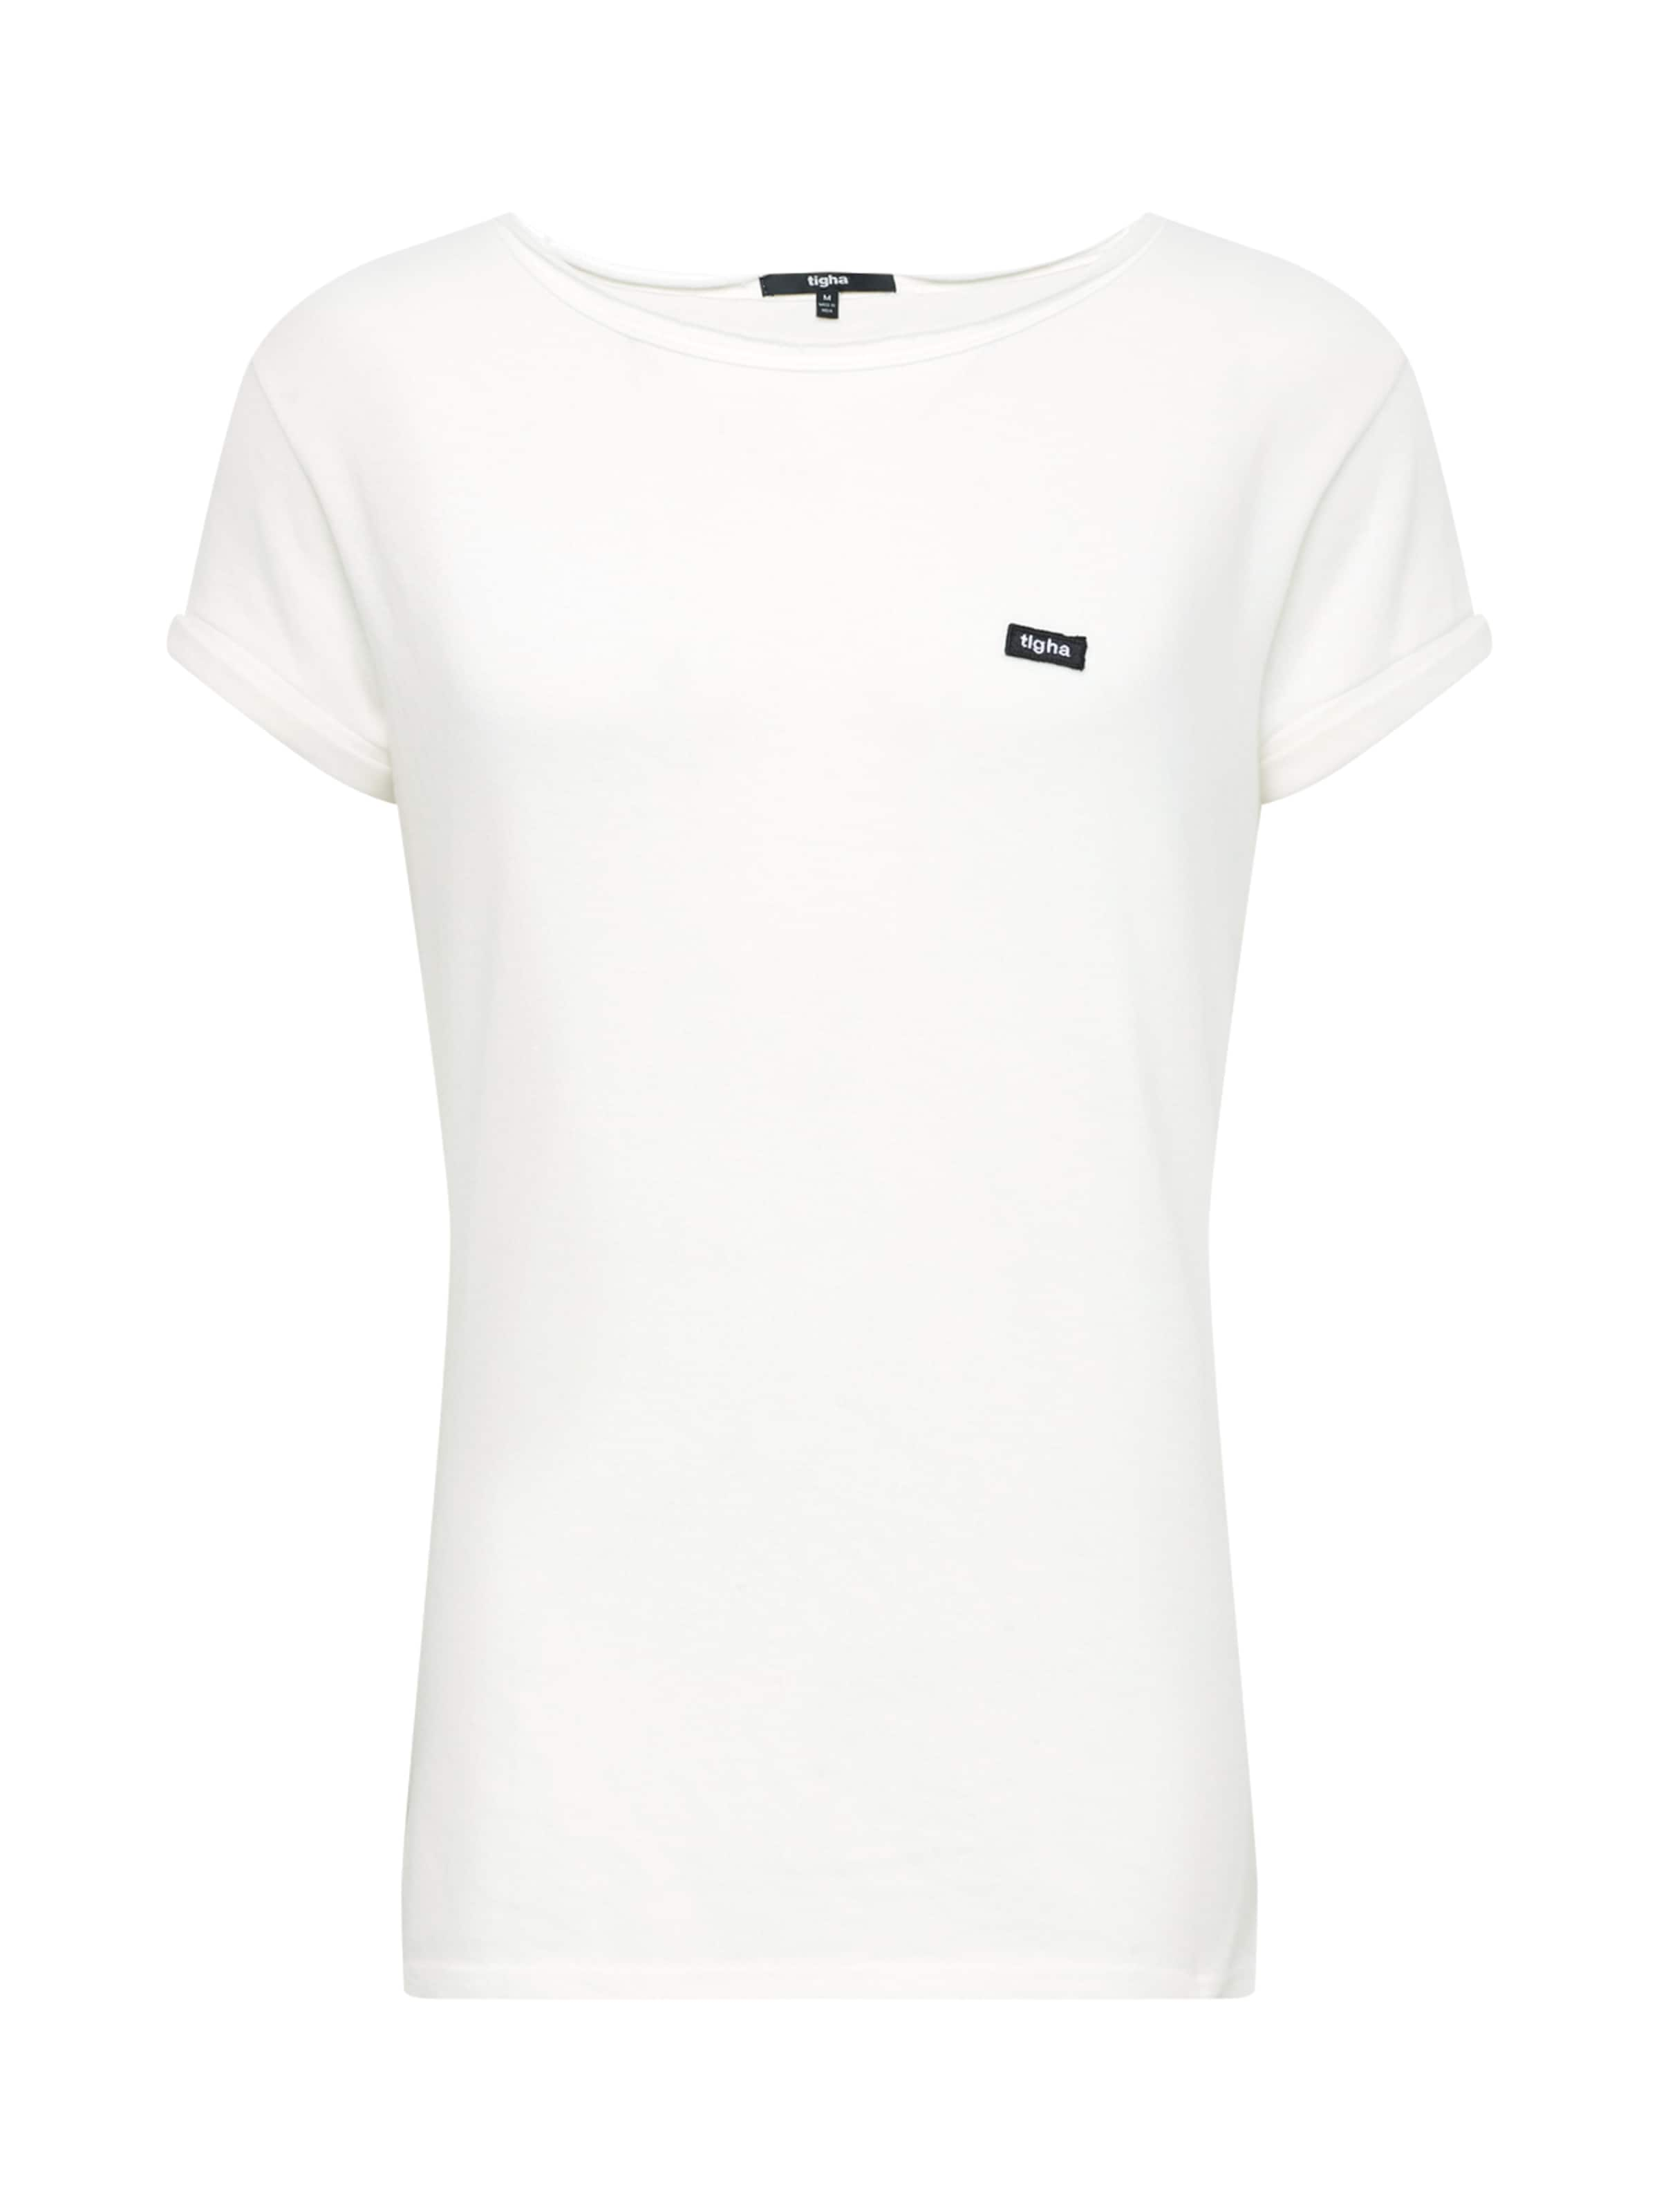 Blanc Tigha 'maurice' En shirt T pzVUSM